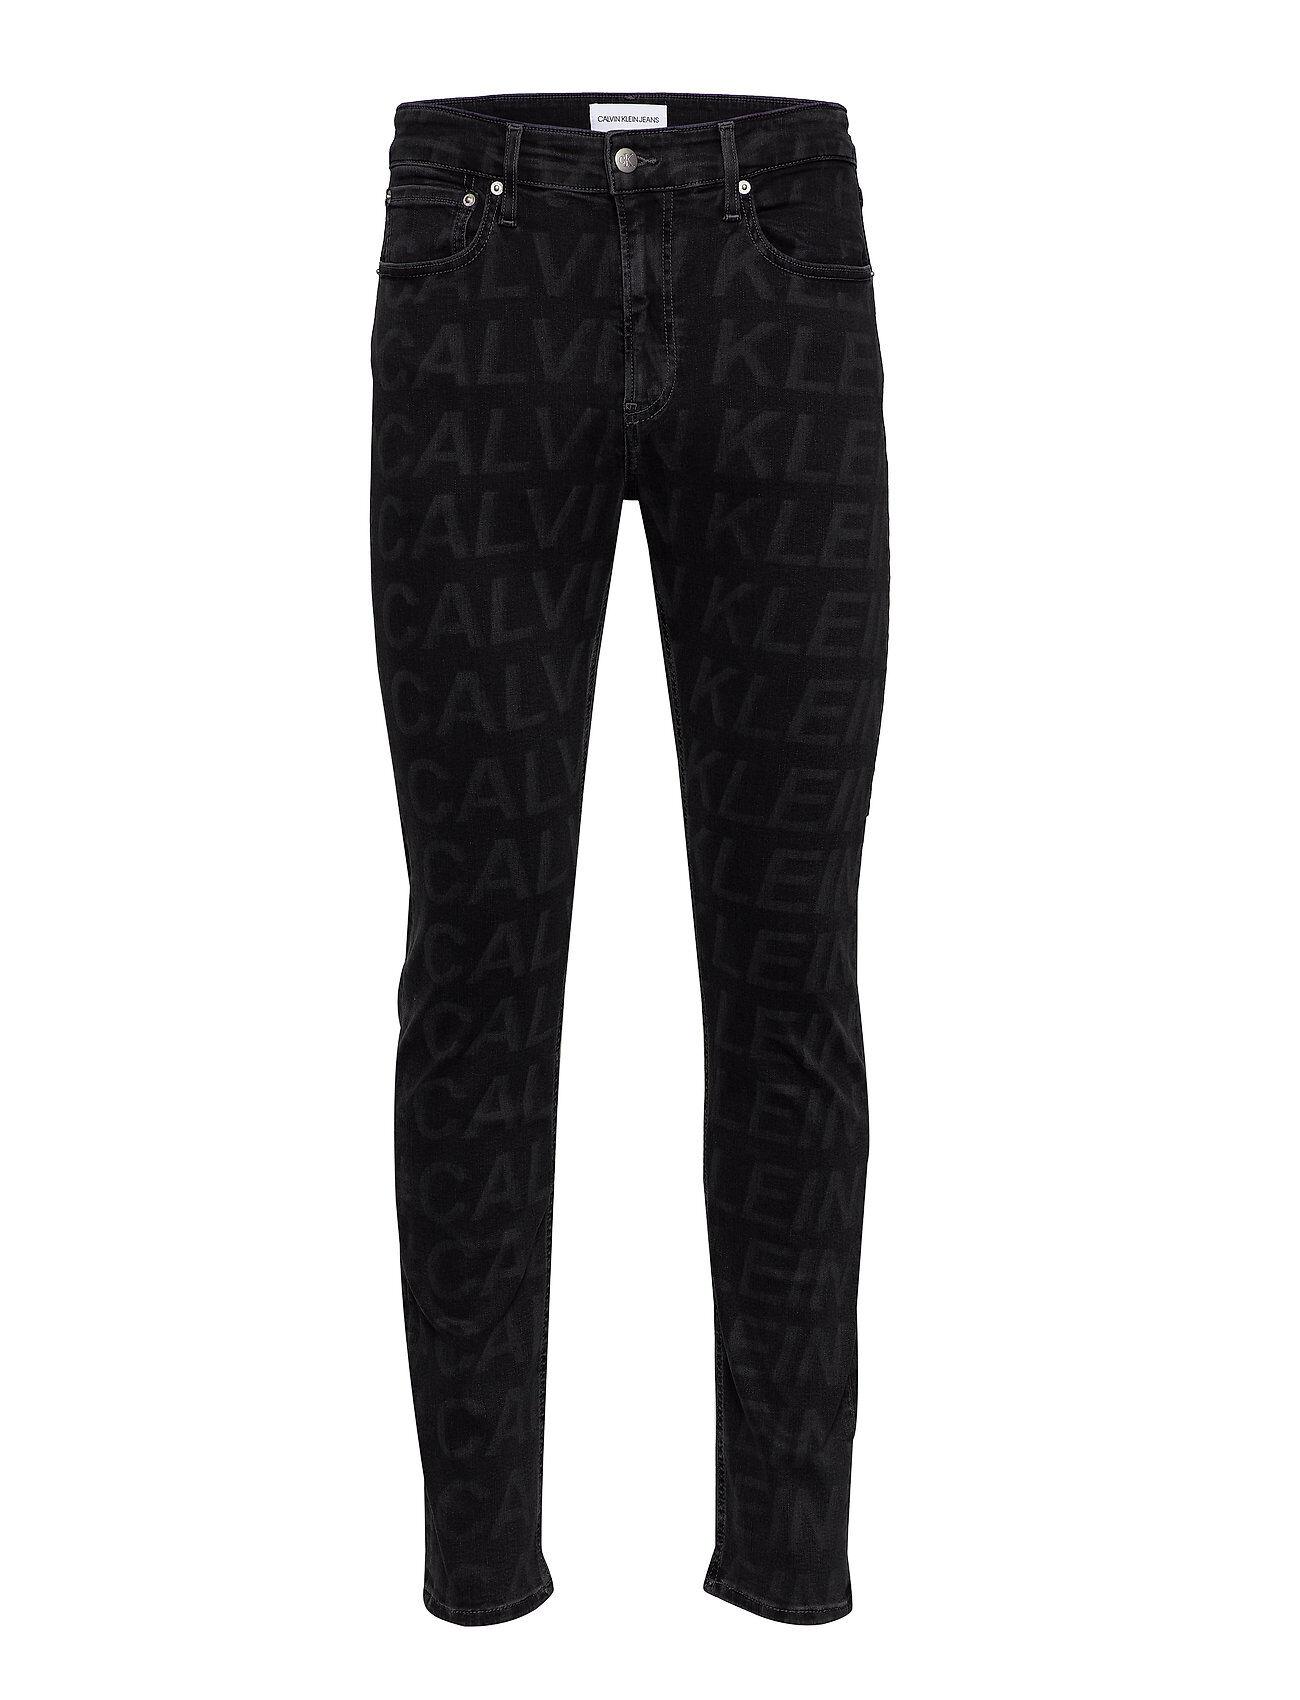 Image of Calvin Ckj 058 Slim Taper Tiukat Farkut Harmaa Calvin Klein Jeans